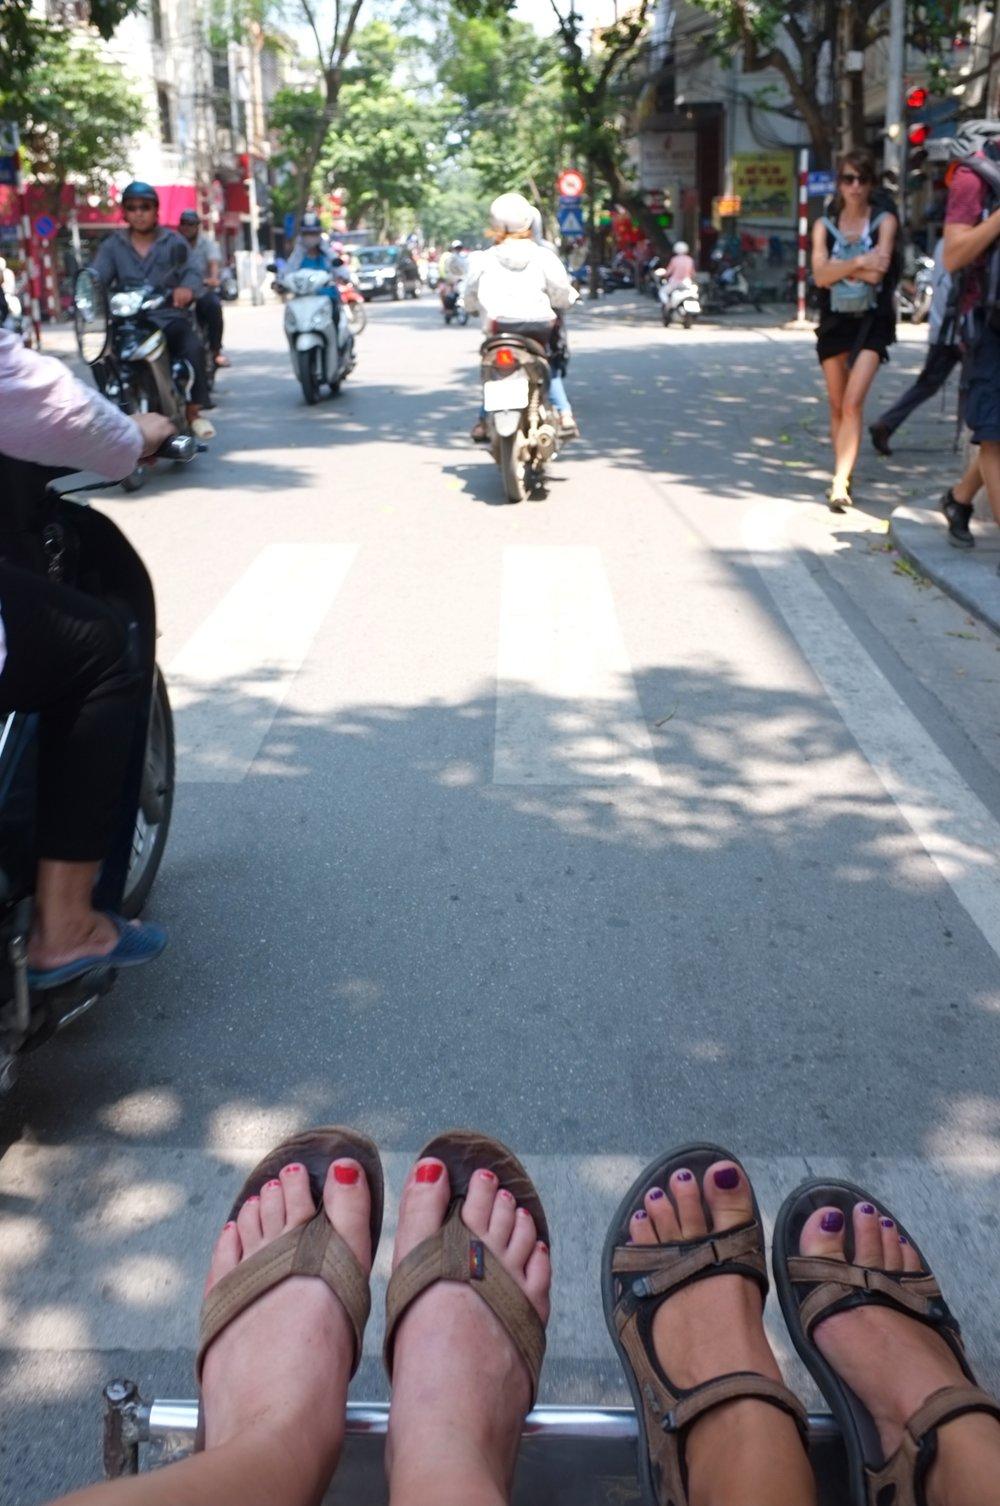 Getting a bike taxi